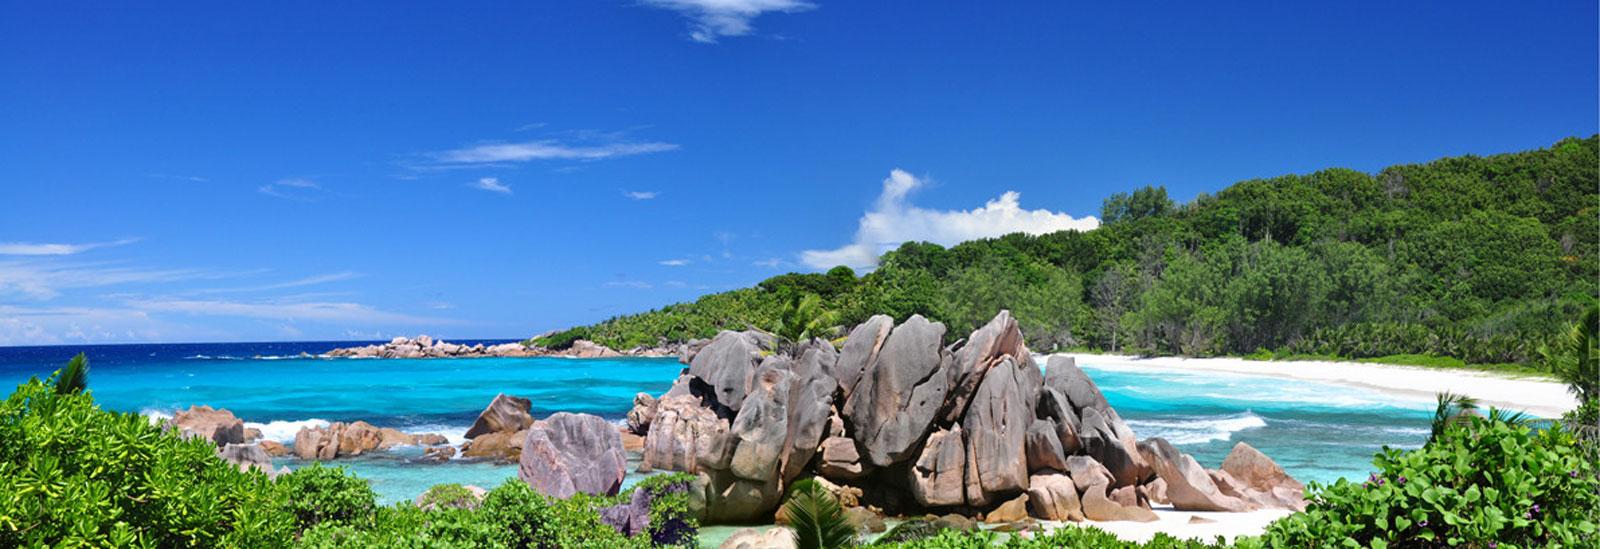 Paste 2021 - Sejur Luxury Seychelles cu Razvan Pascu, 9 zile